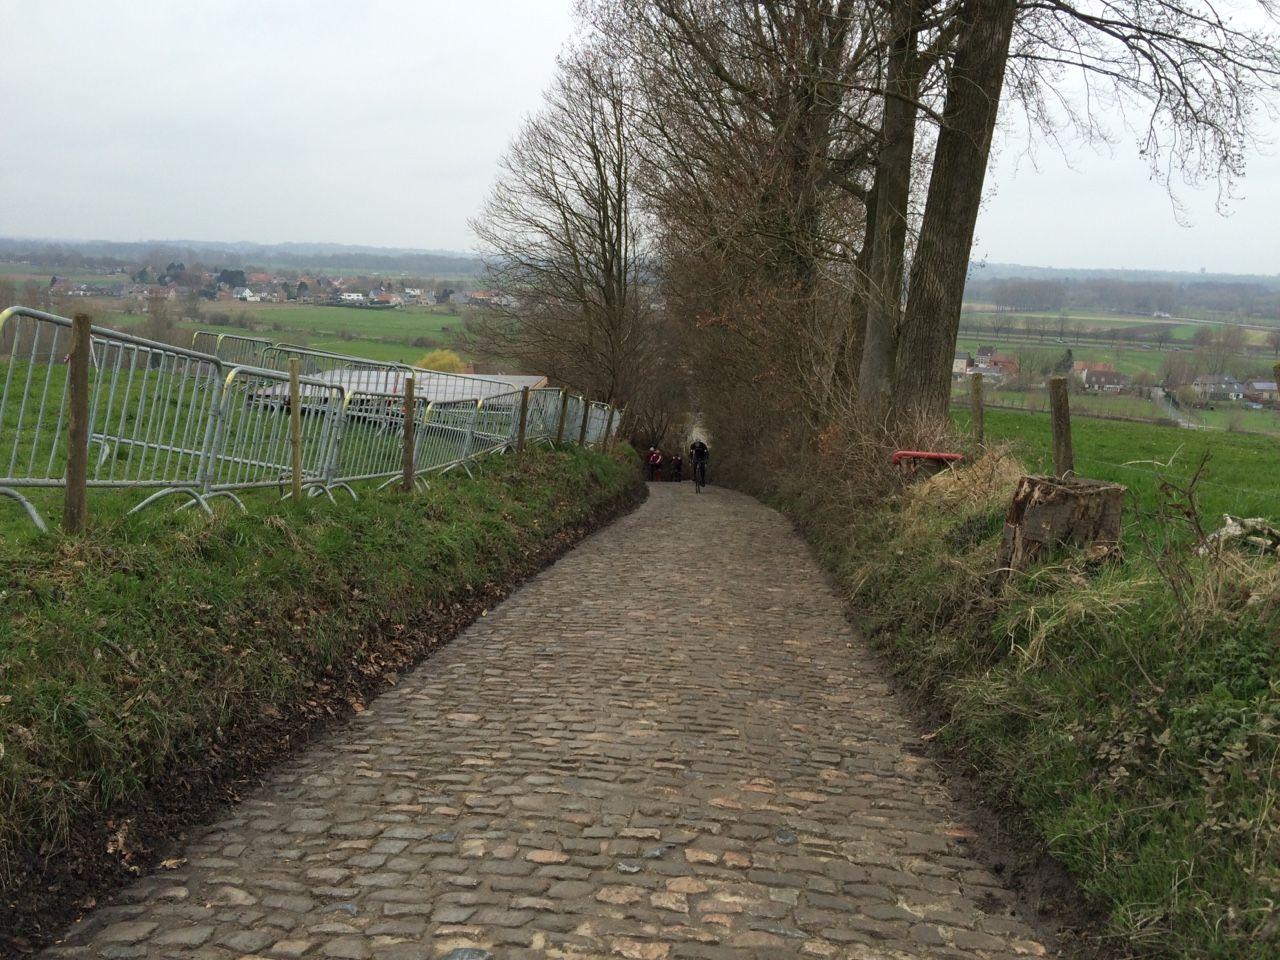 It was muddy on the Koppenberg Today. #rvv #tof #flanders #vlaanderen